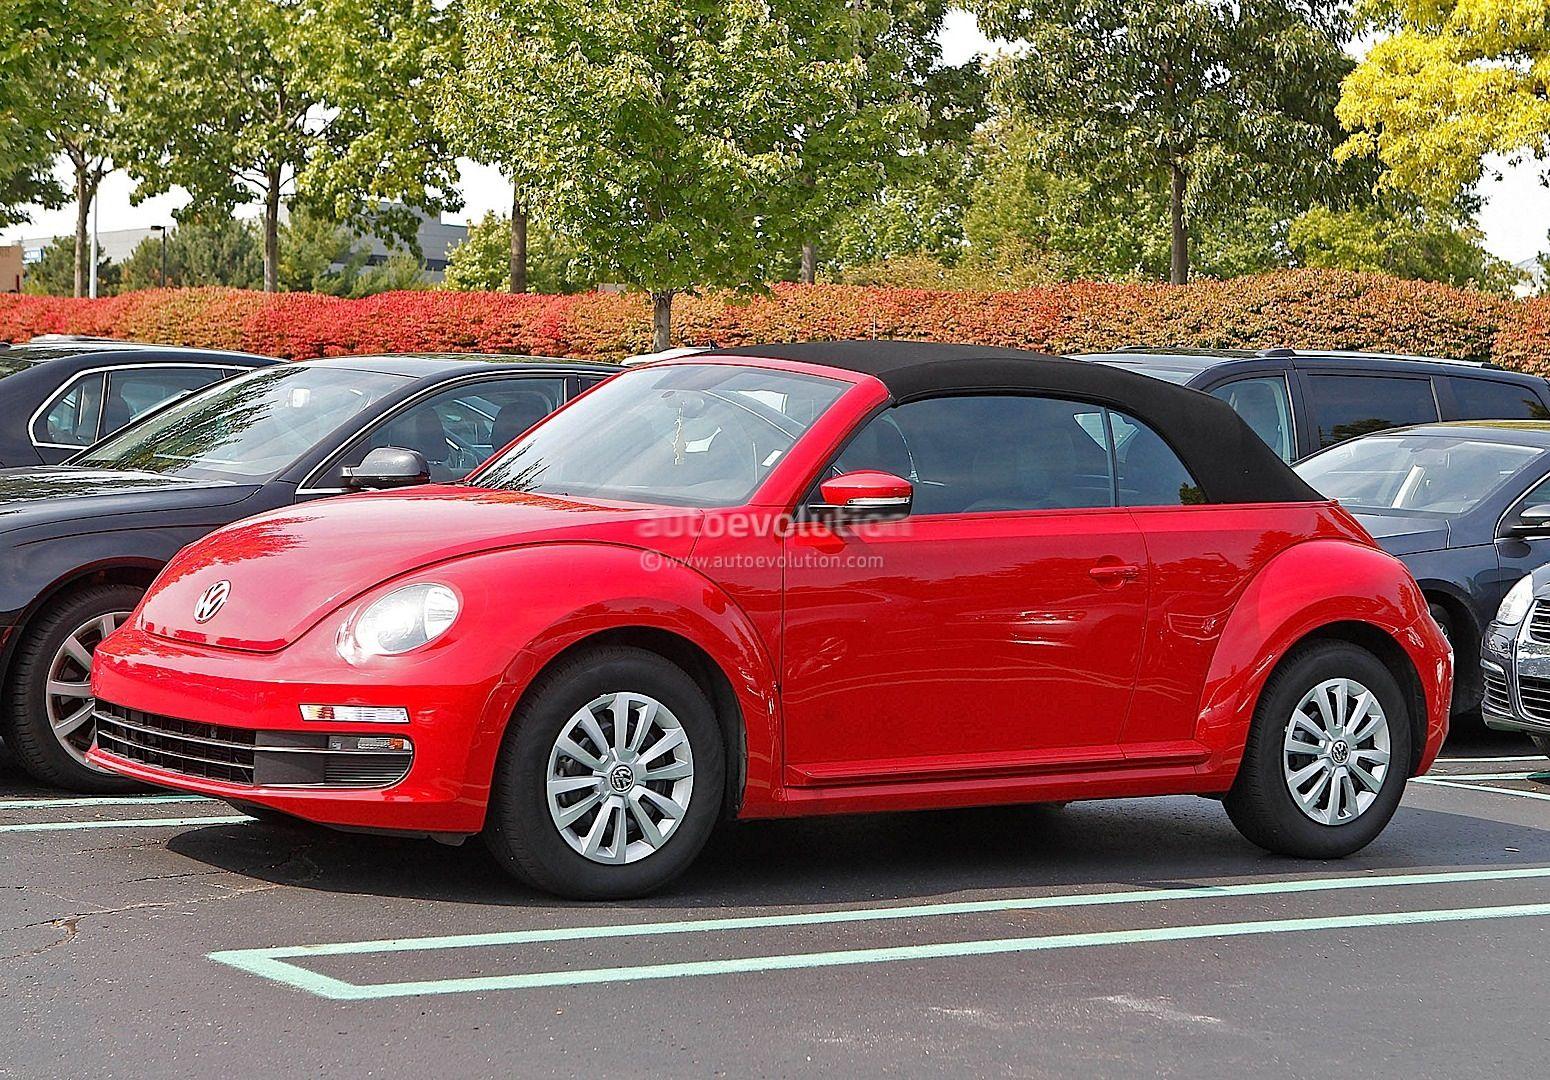 Best 25 new beetle 2014 ideas on pinterest vw bugs vw beetle 2014 and vw us